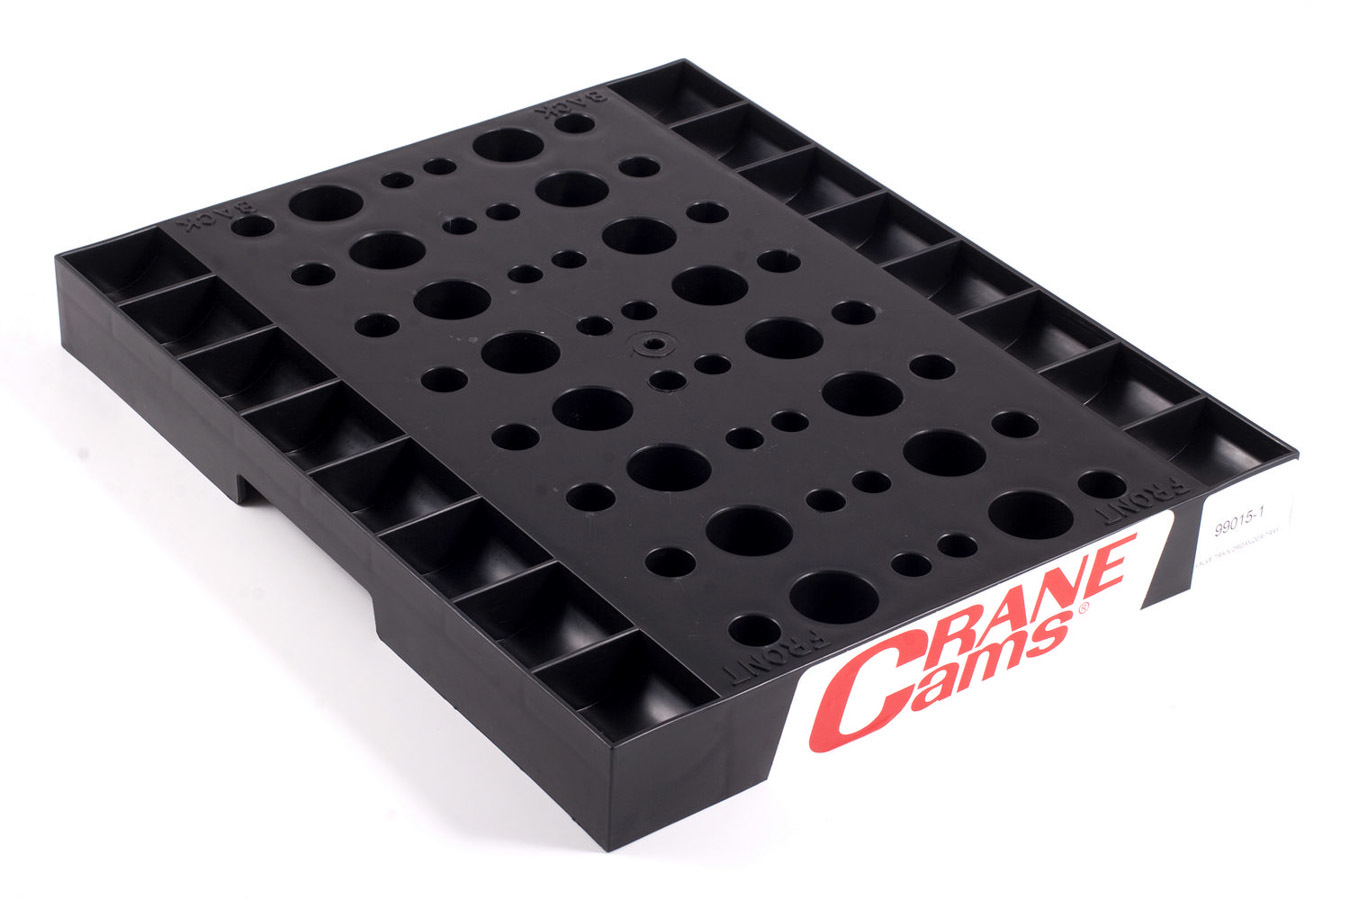 Crane 99015-1 Valvetrain Organizer, Rocker Arms / Pushrods / Lifters / Adjusting Nuts, Plastic, Each